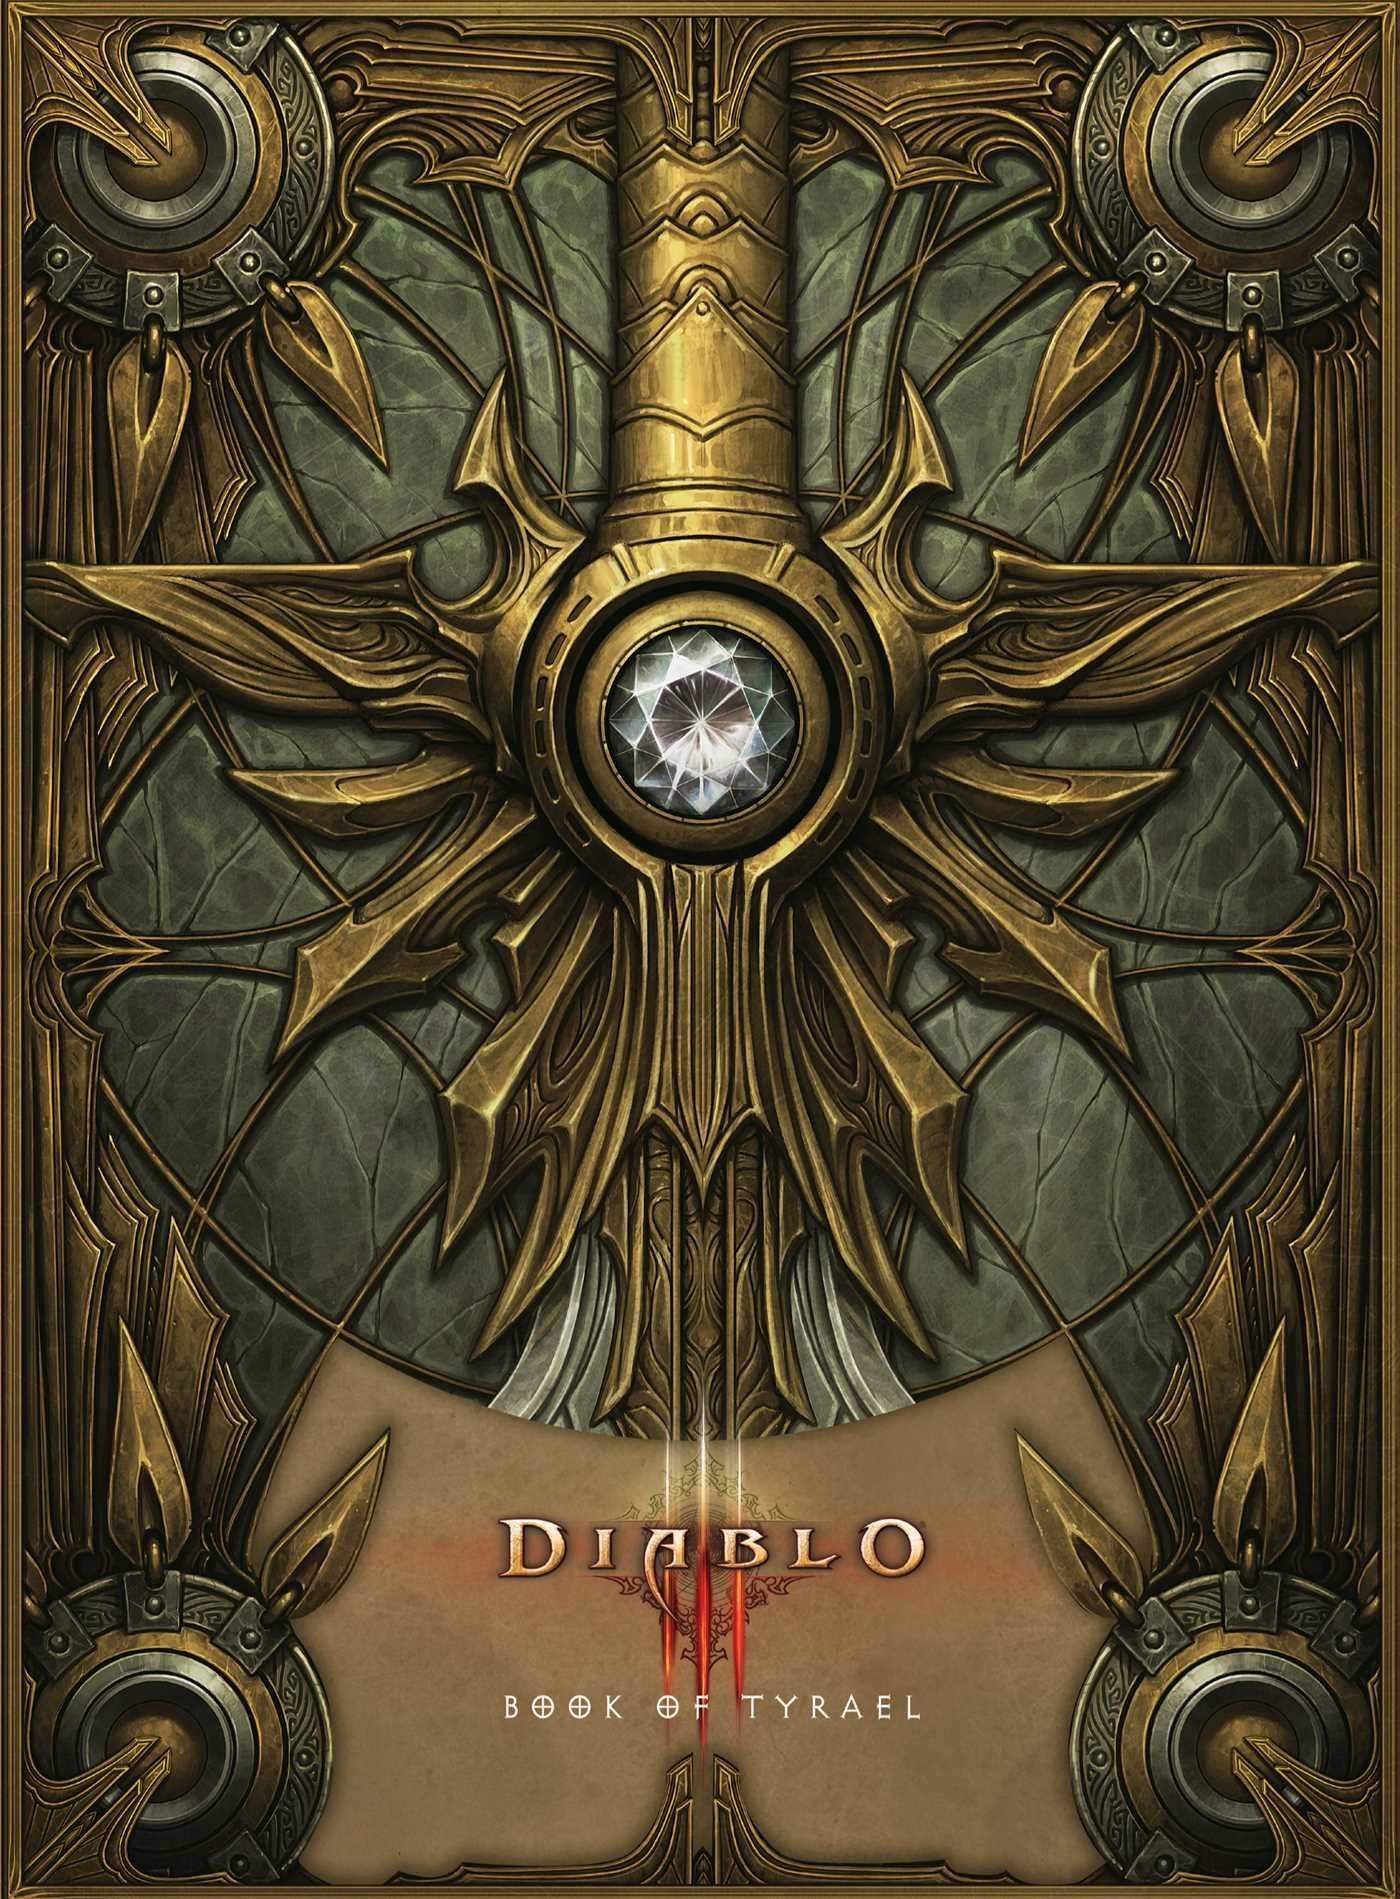 Diablo III - Book of Tyrael